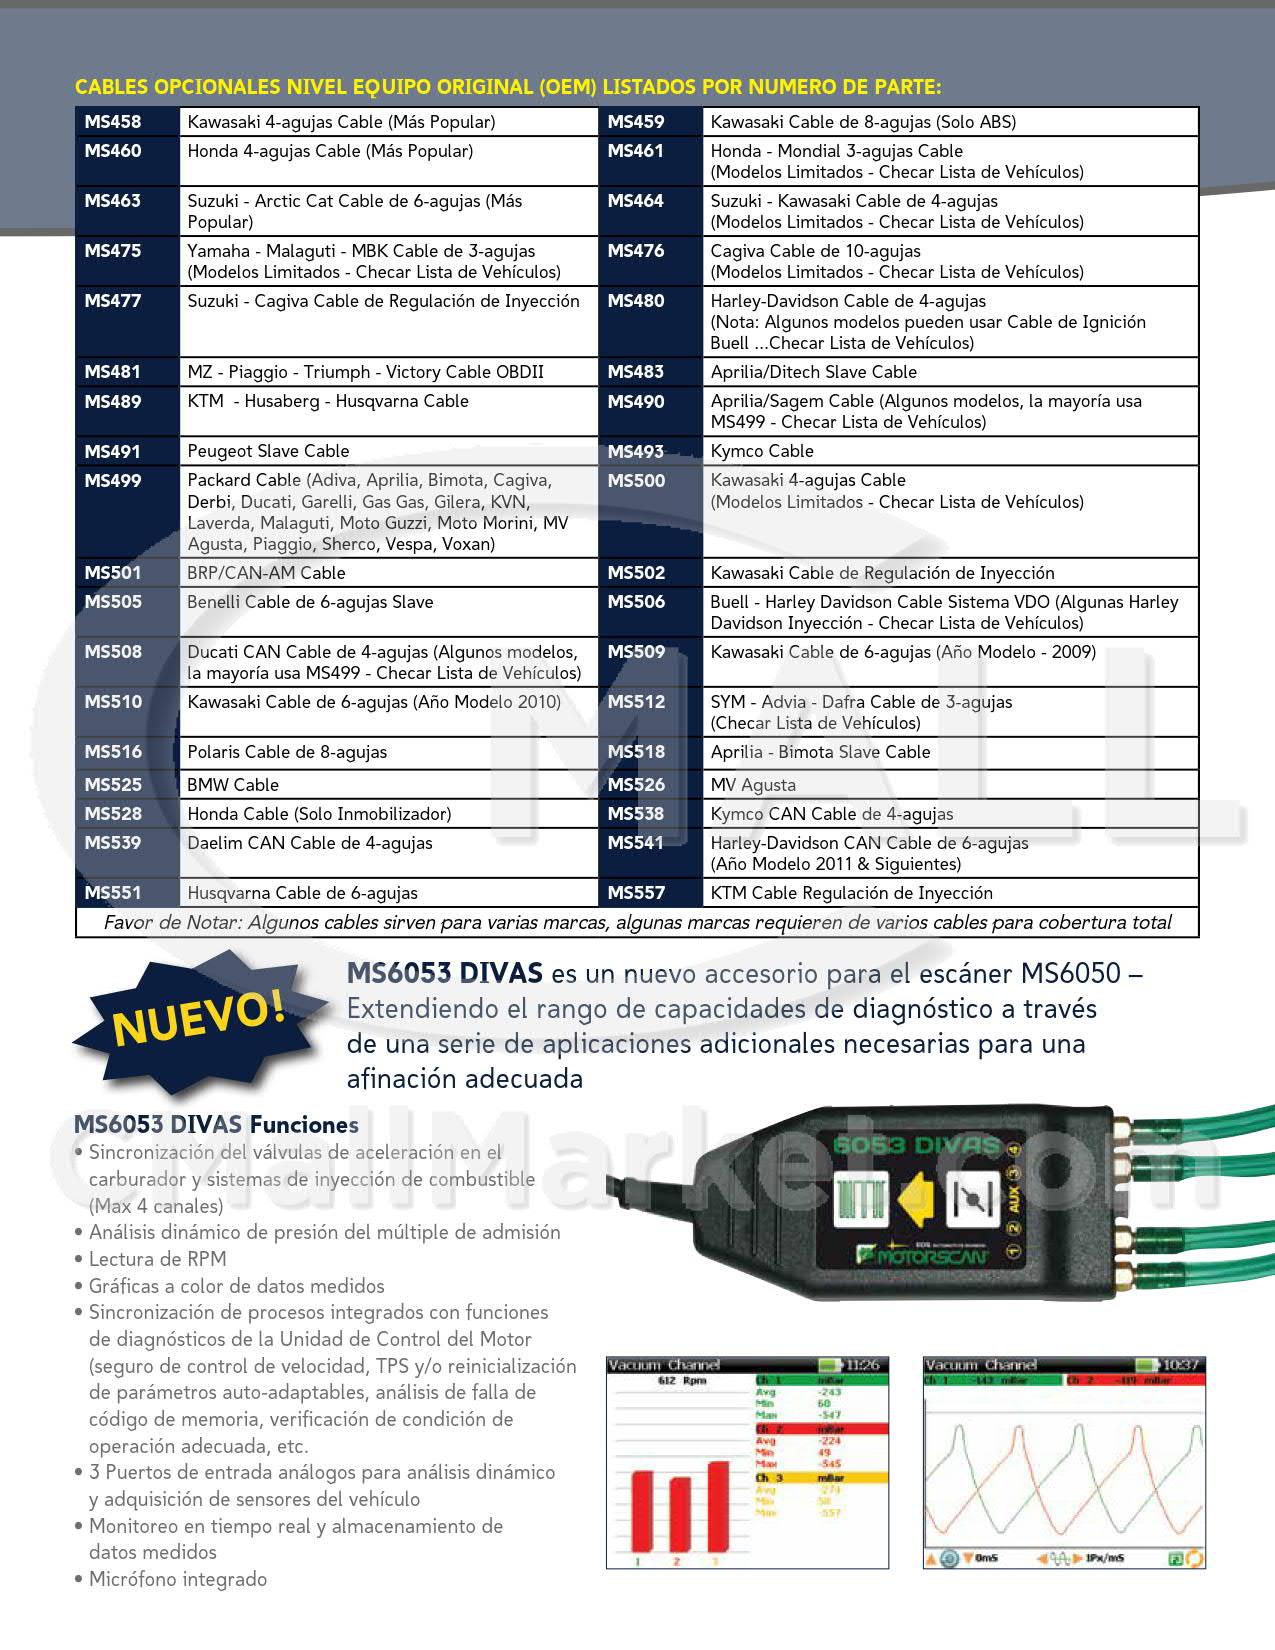 MOTORSCAN MemoBike 6050 CMALL MARKET